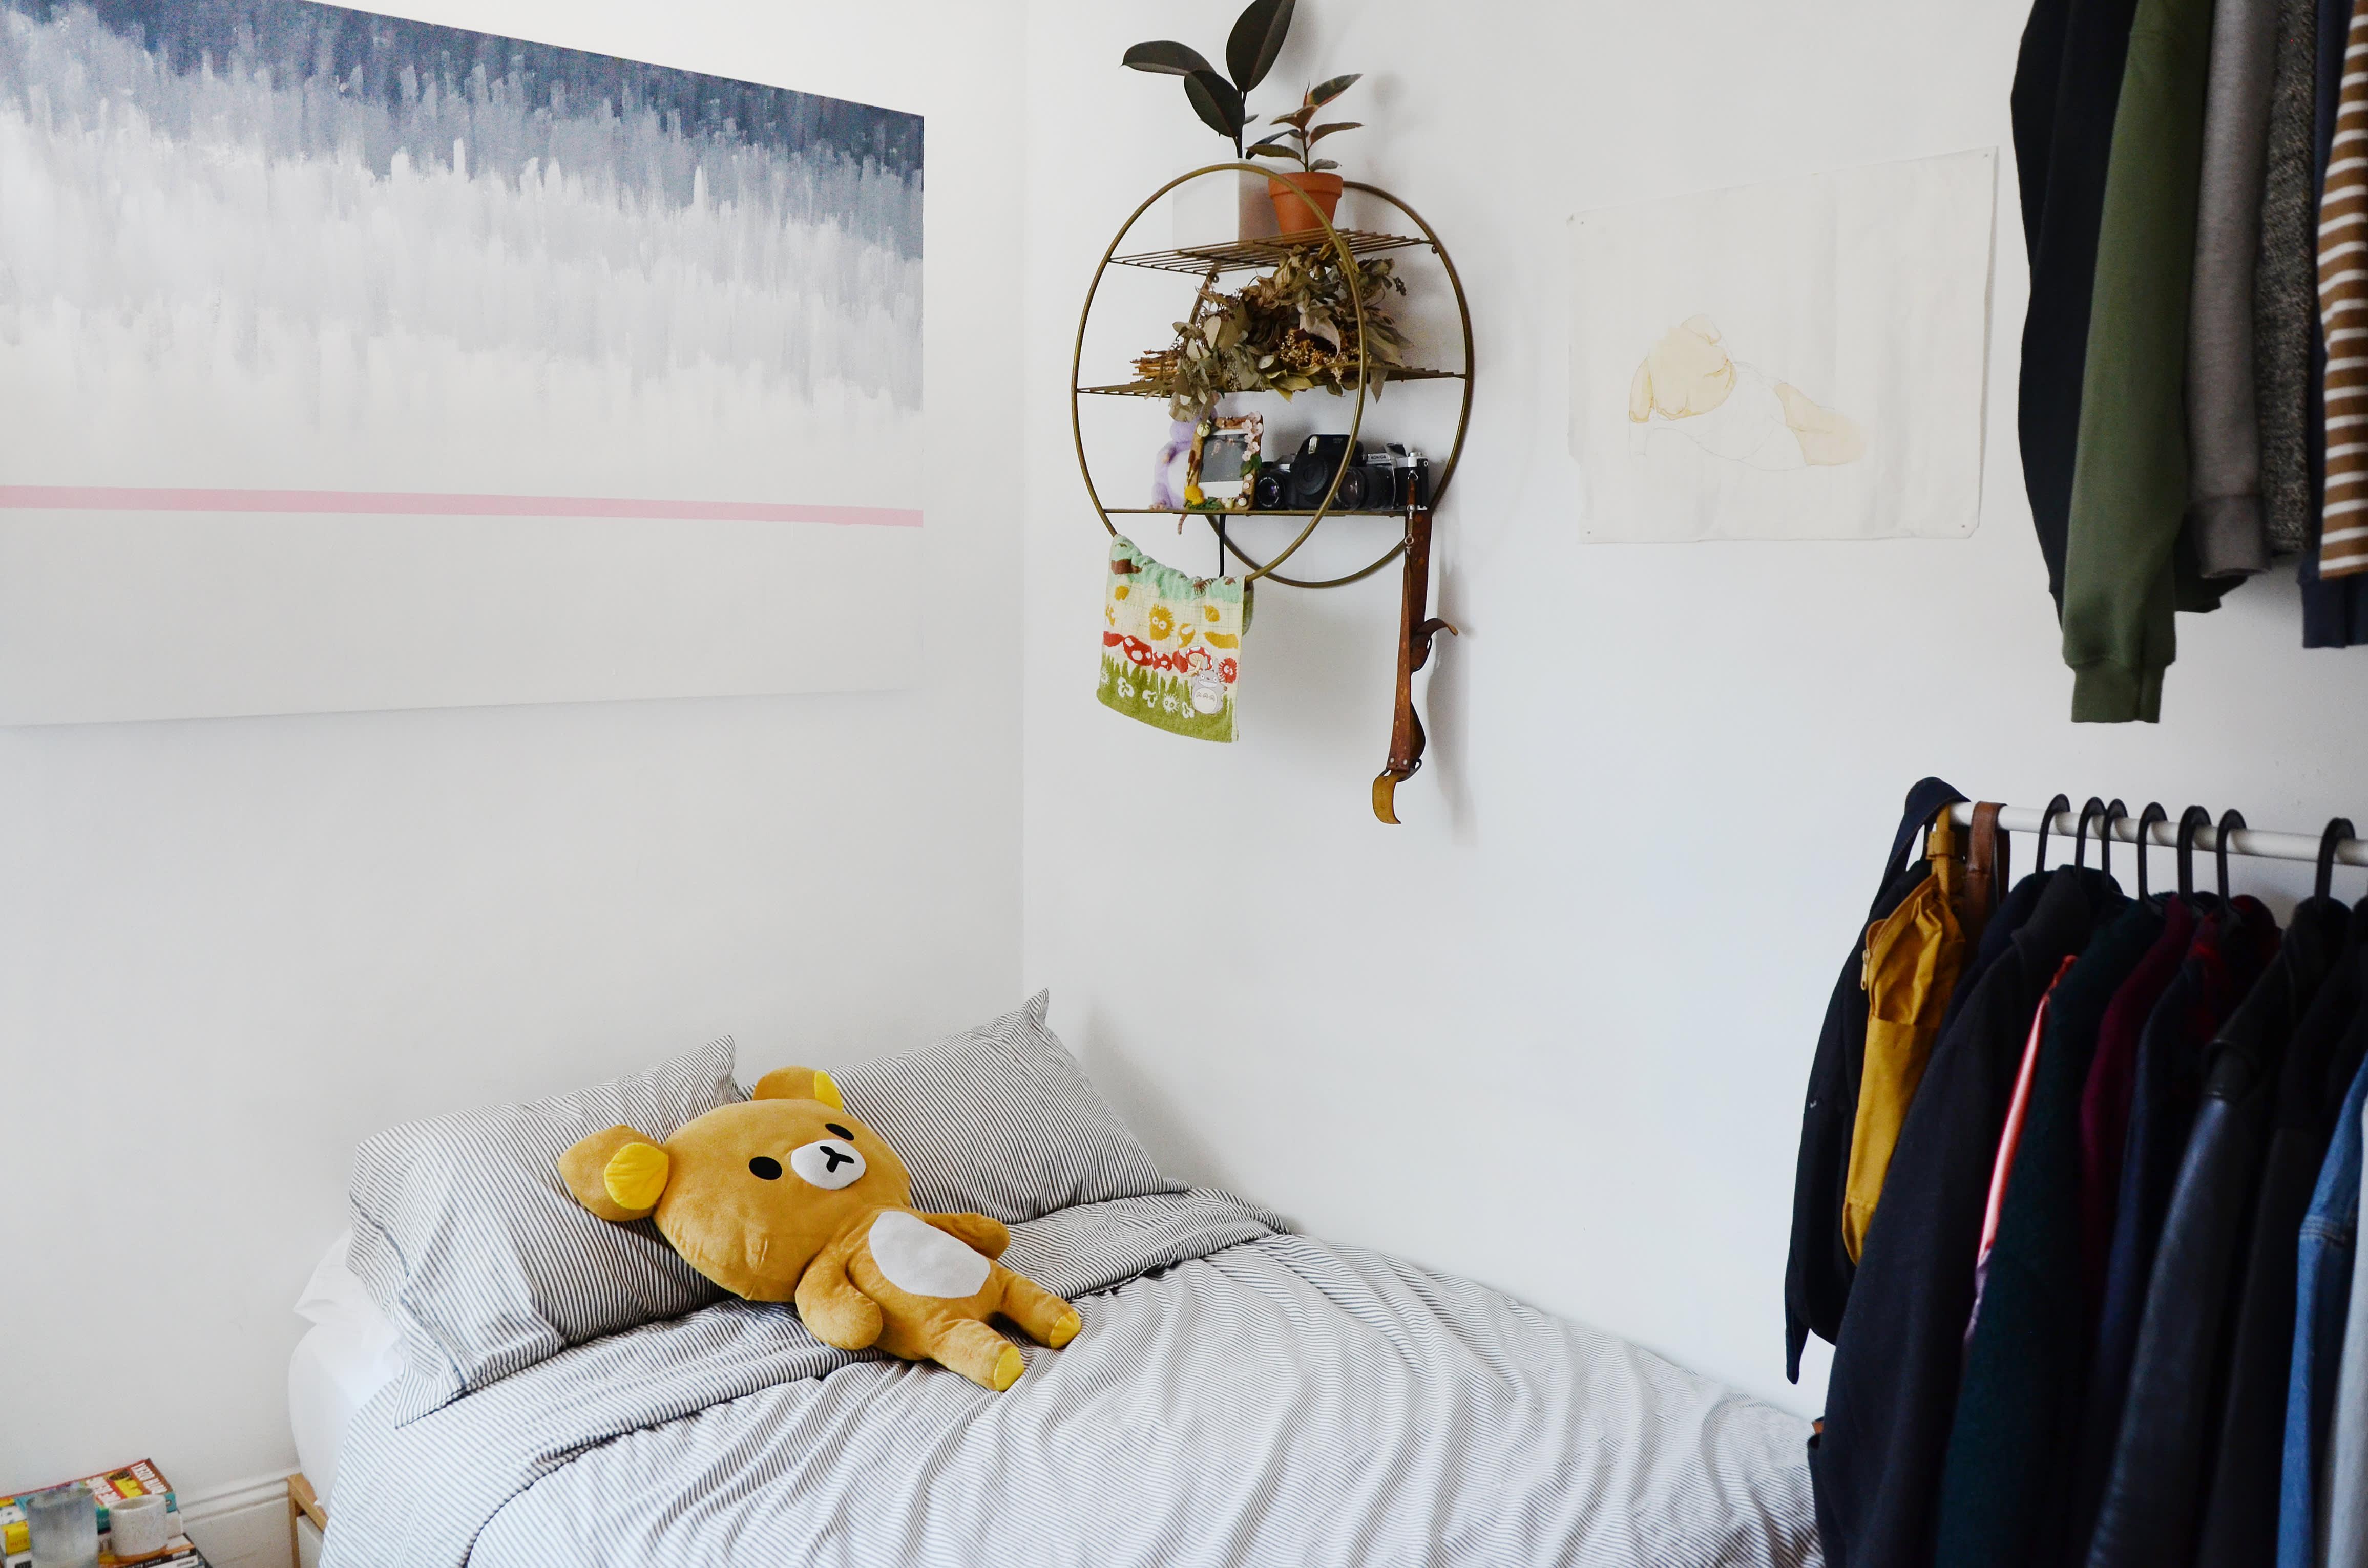 San Francisco Home Tour: A Modern Rental Apartment